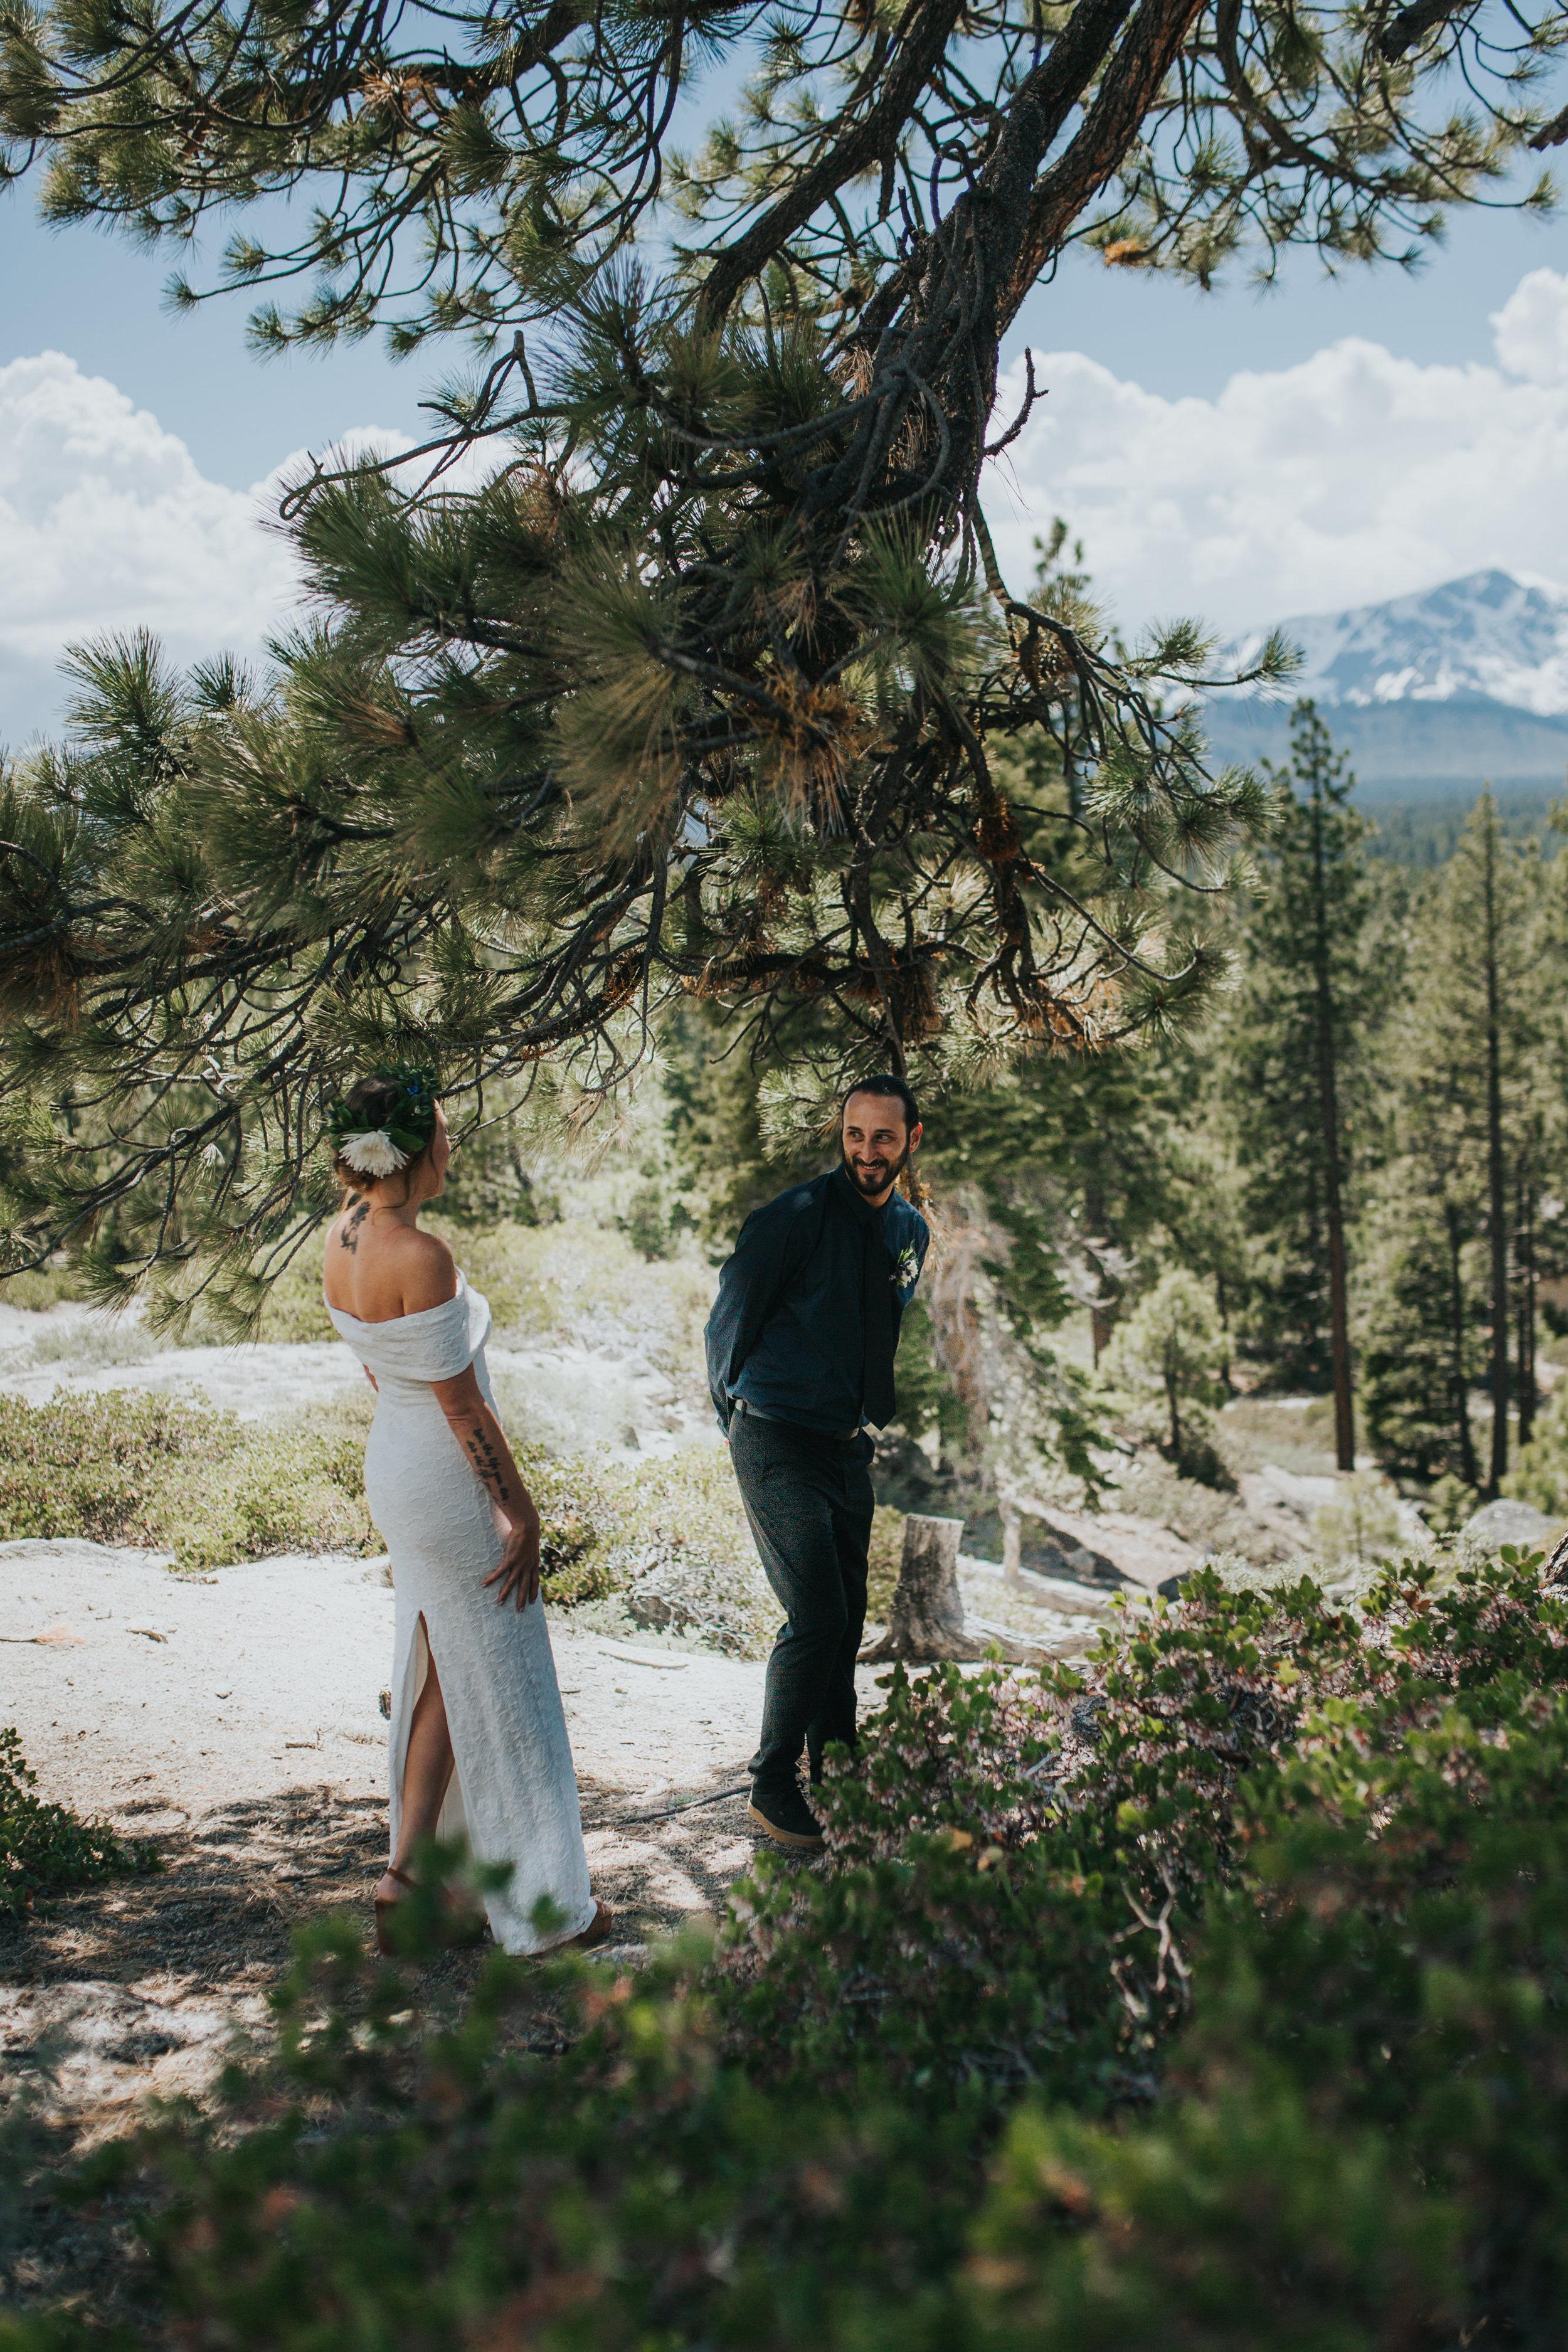 south-lake-tahoe-elopement-valerie-lendvay-photo-006.jpg